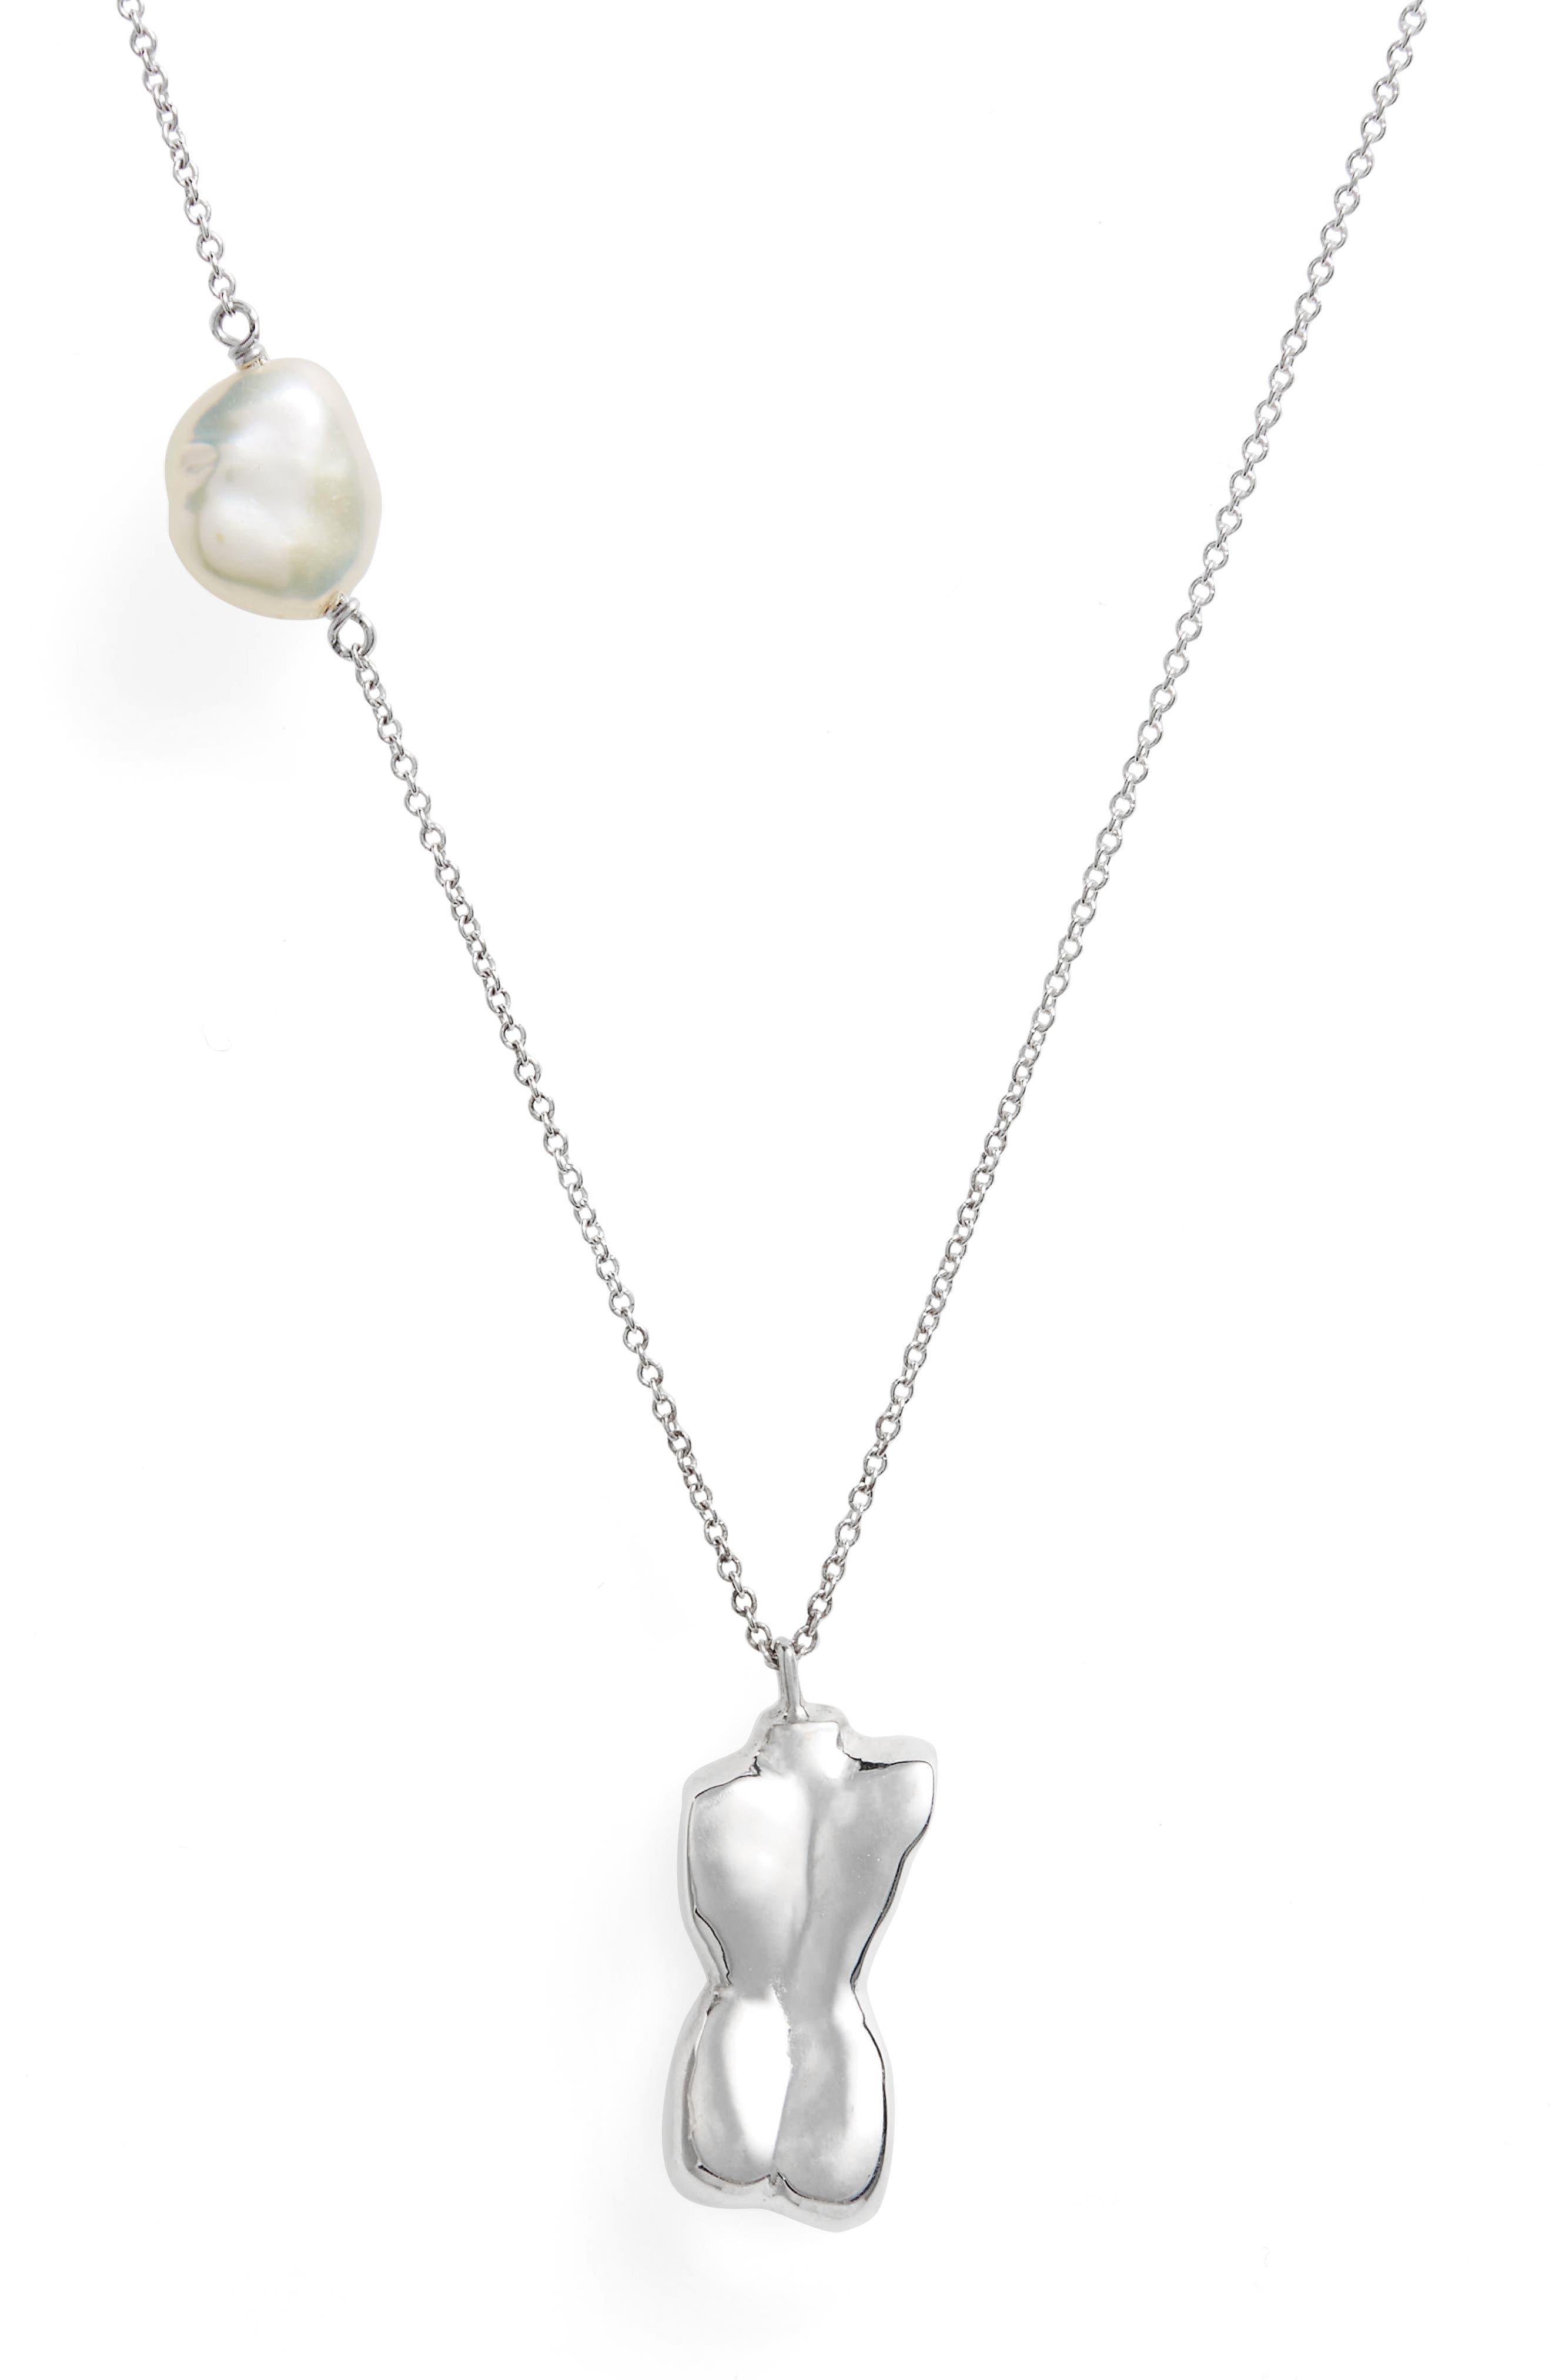 Bod Pendant Necklace,                             Main thumbnail 1, color,                             Sterling Silver/ White Keshi